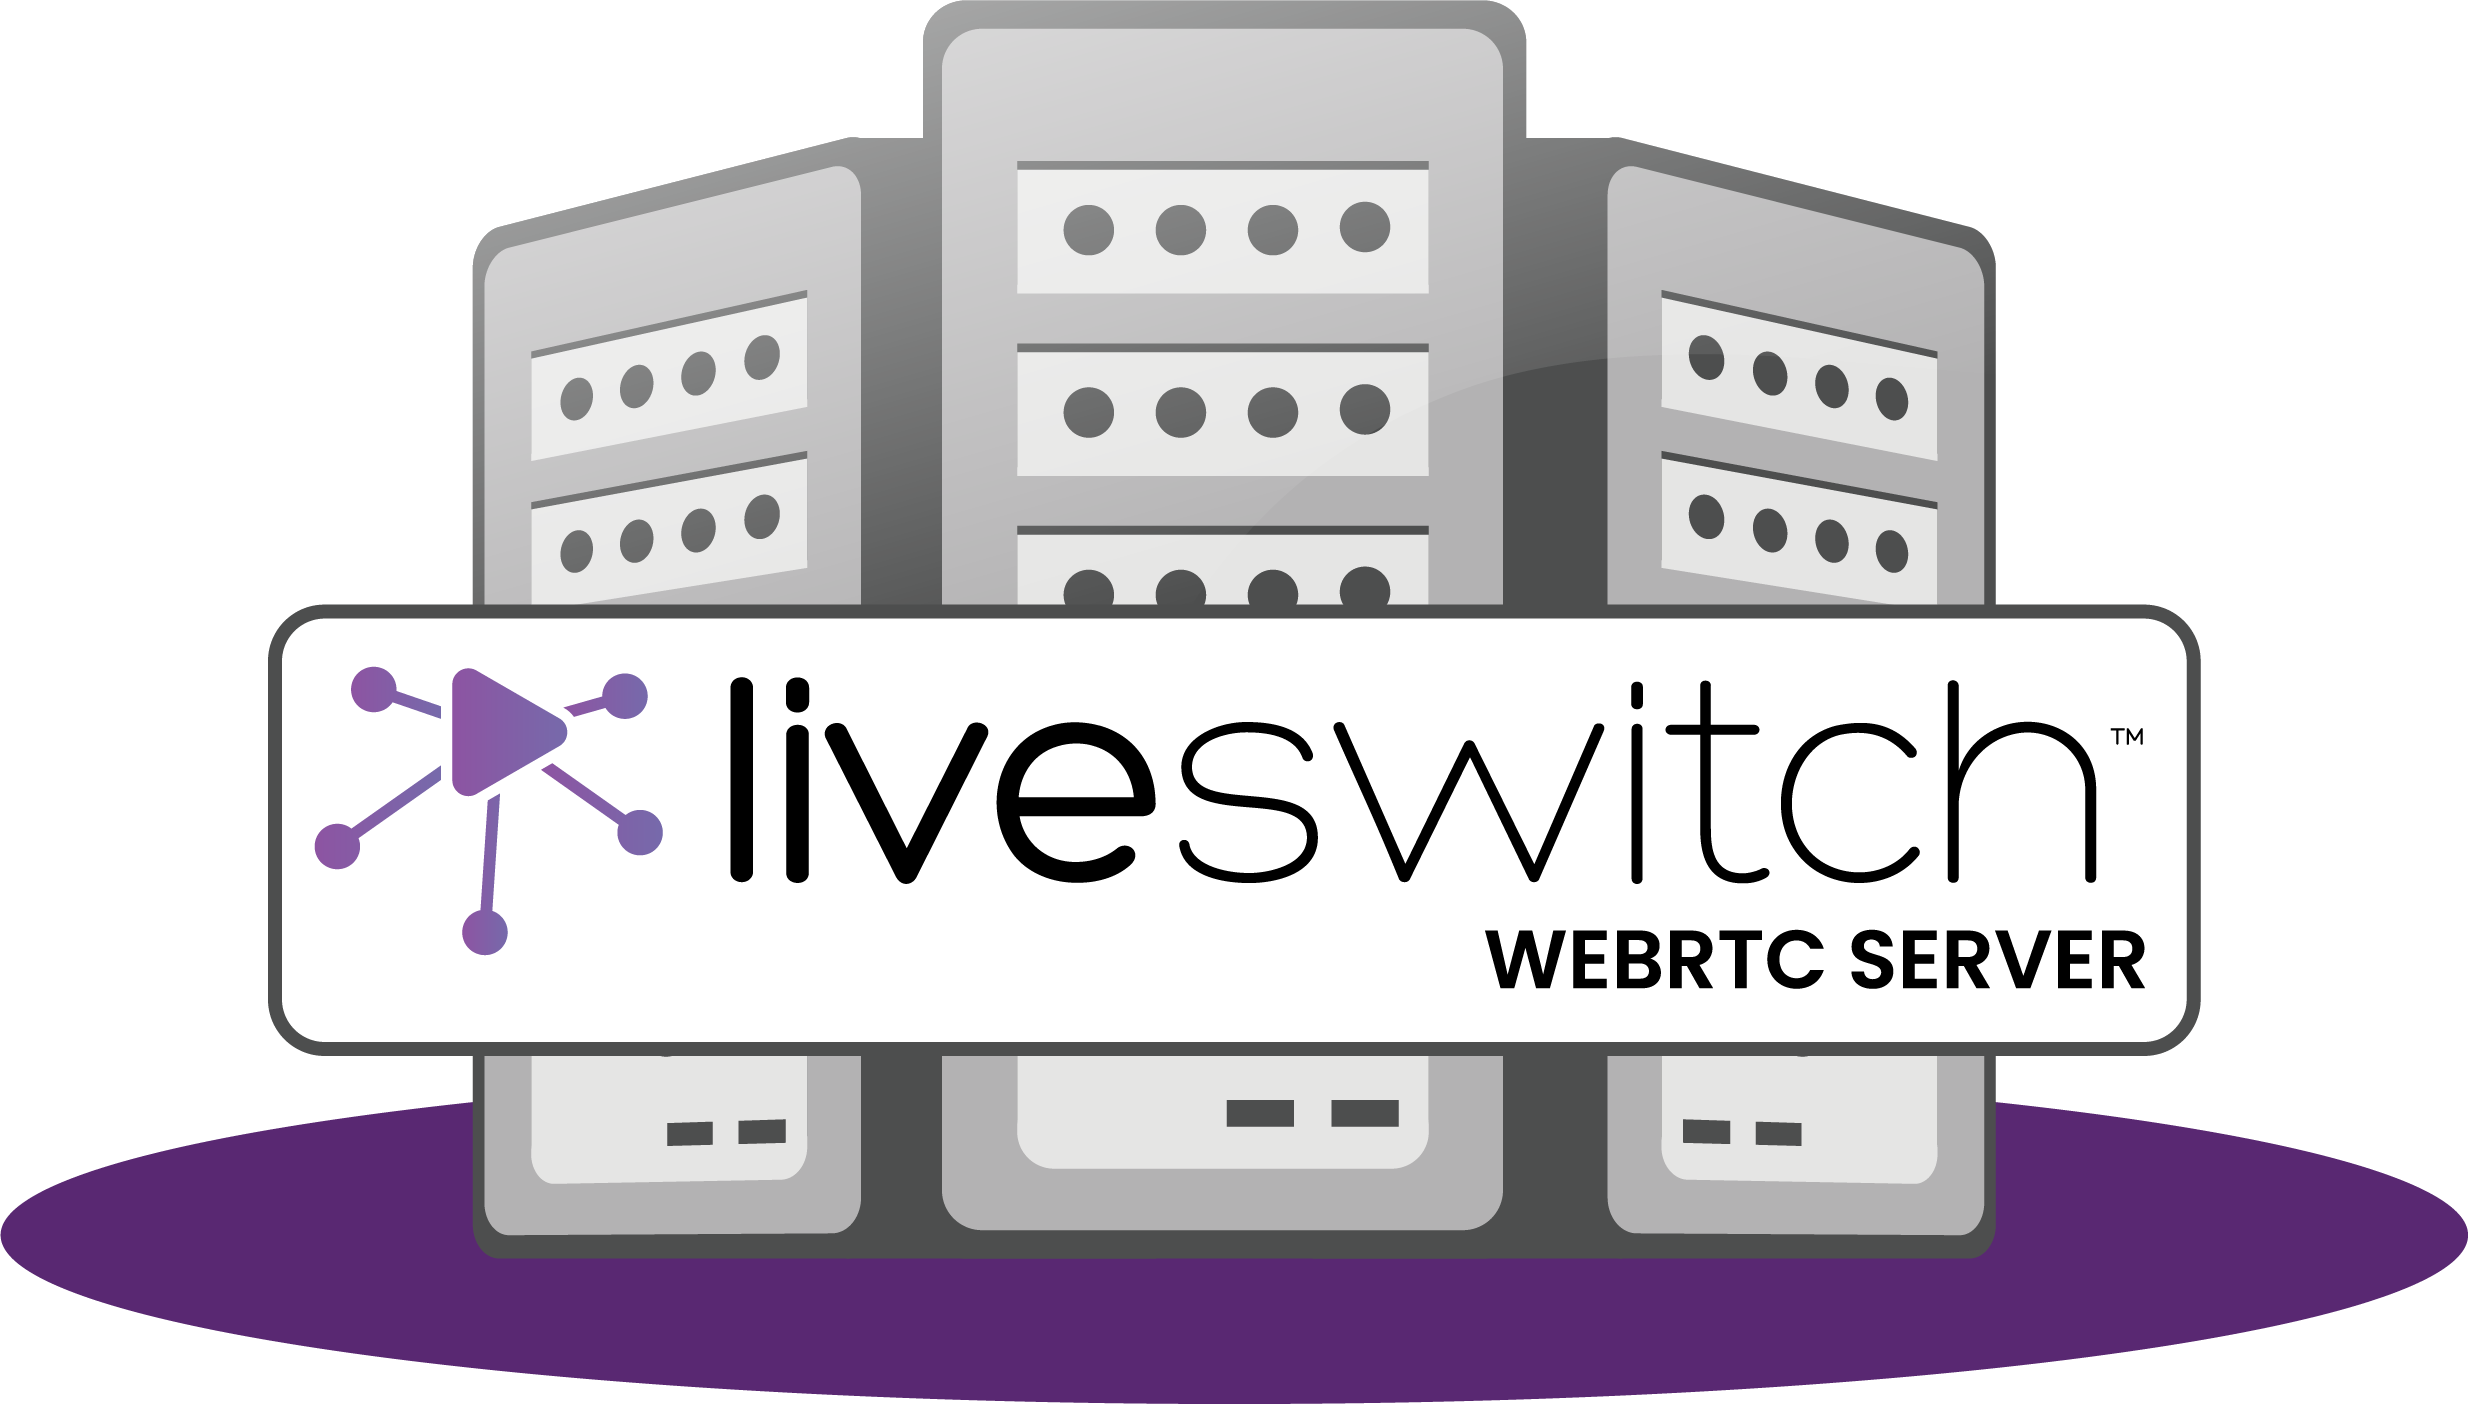 LiveSwitch WebRTC Server